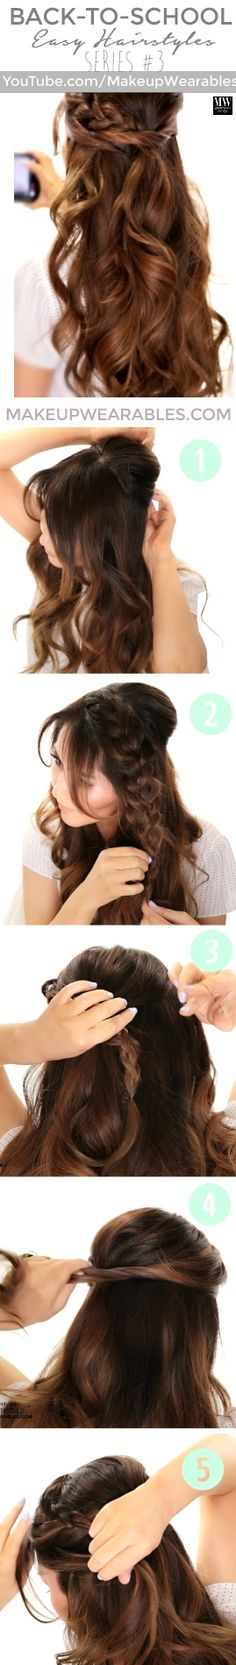 Easy Back-to-School Hair